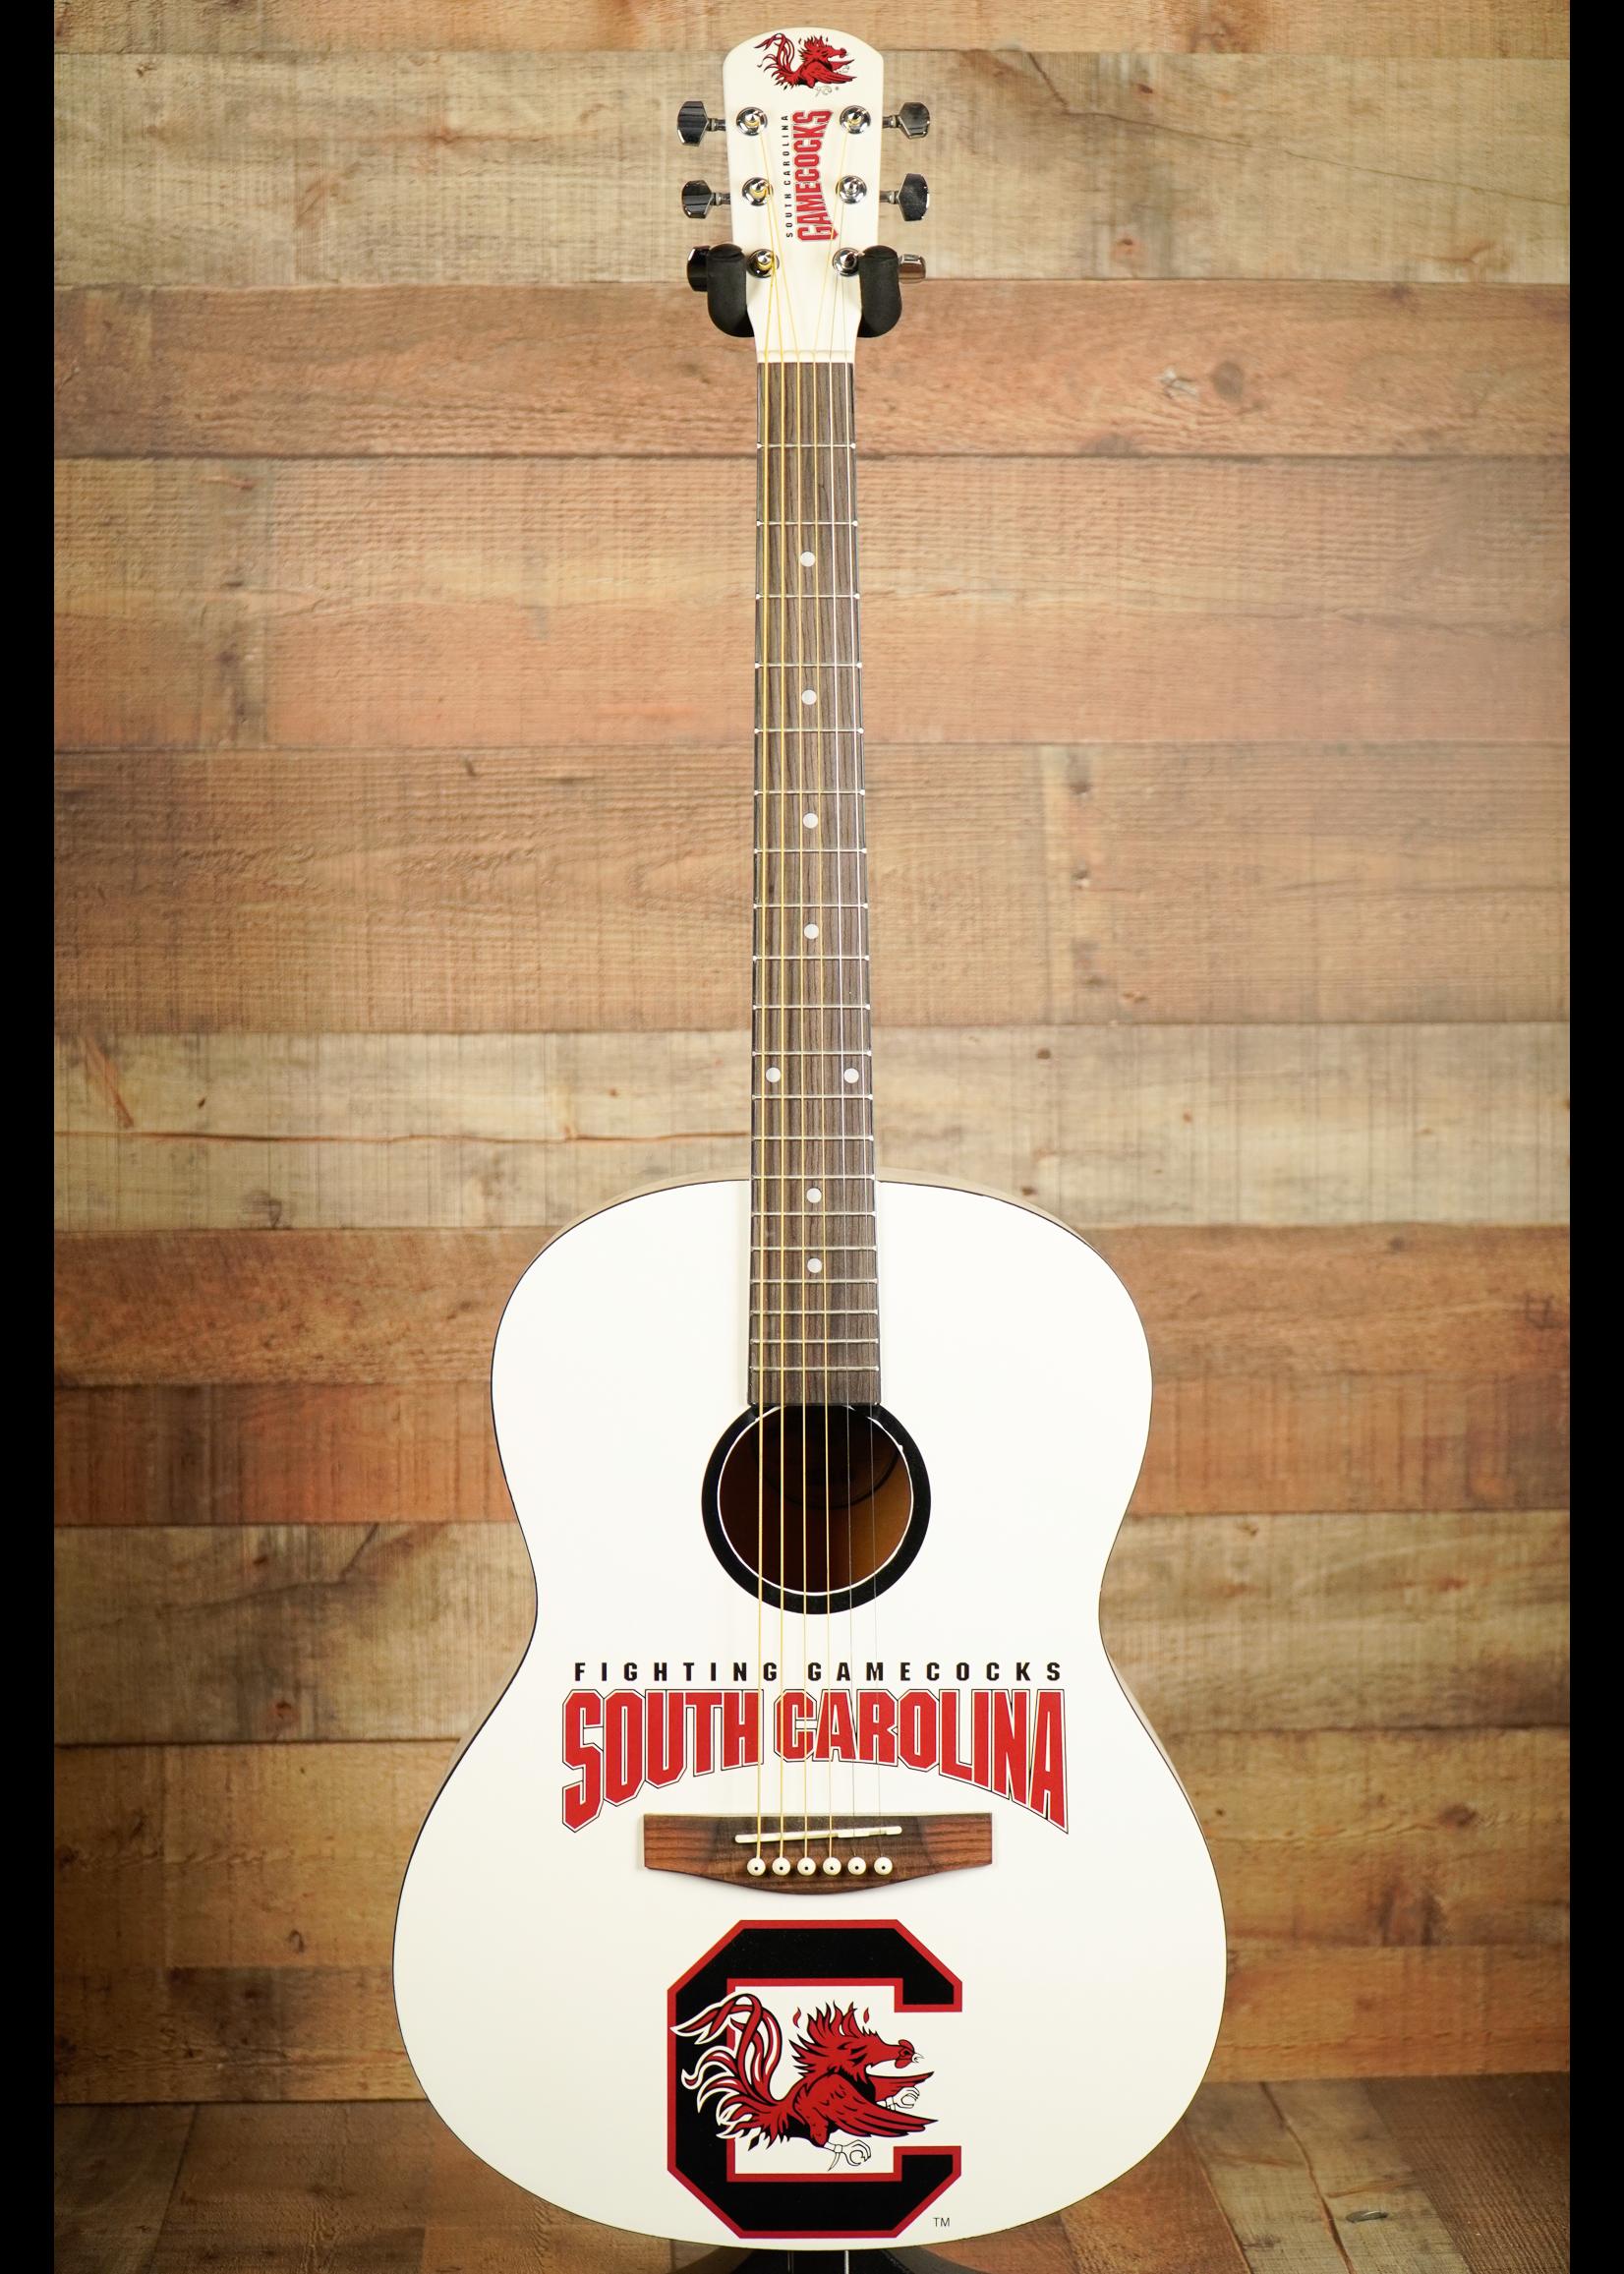 indiana guitar company Indiana Guitar Company Collegiate Acoustic Guitar 2014 South Carolina